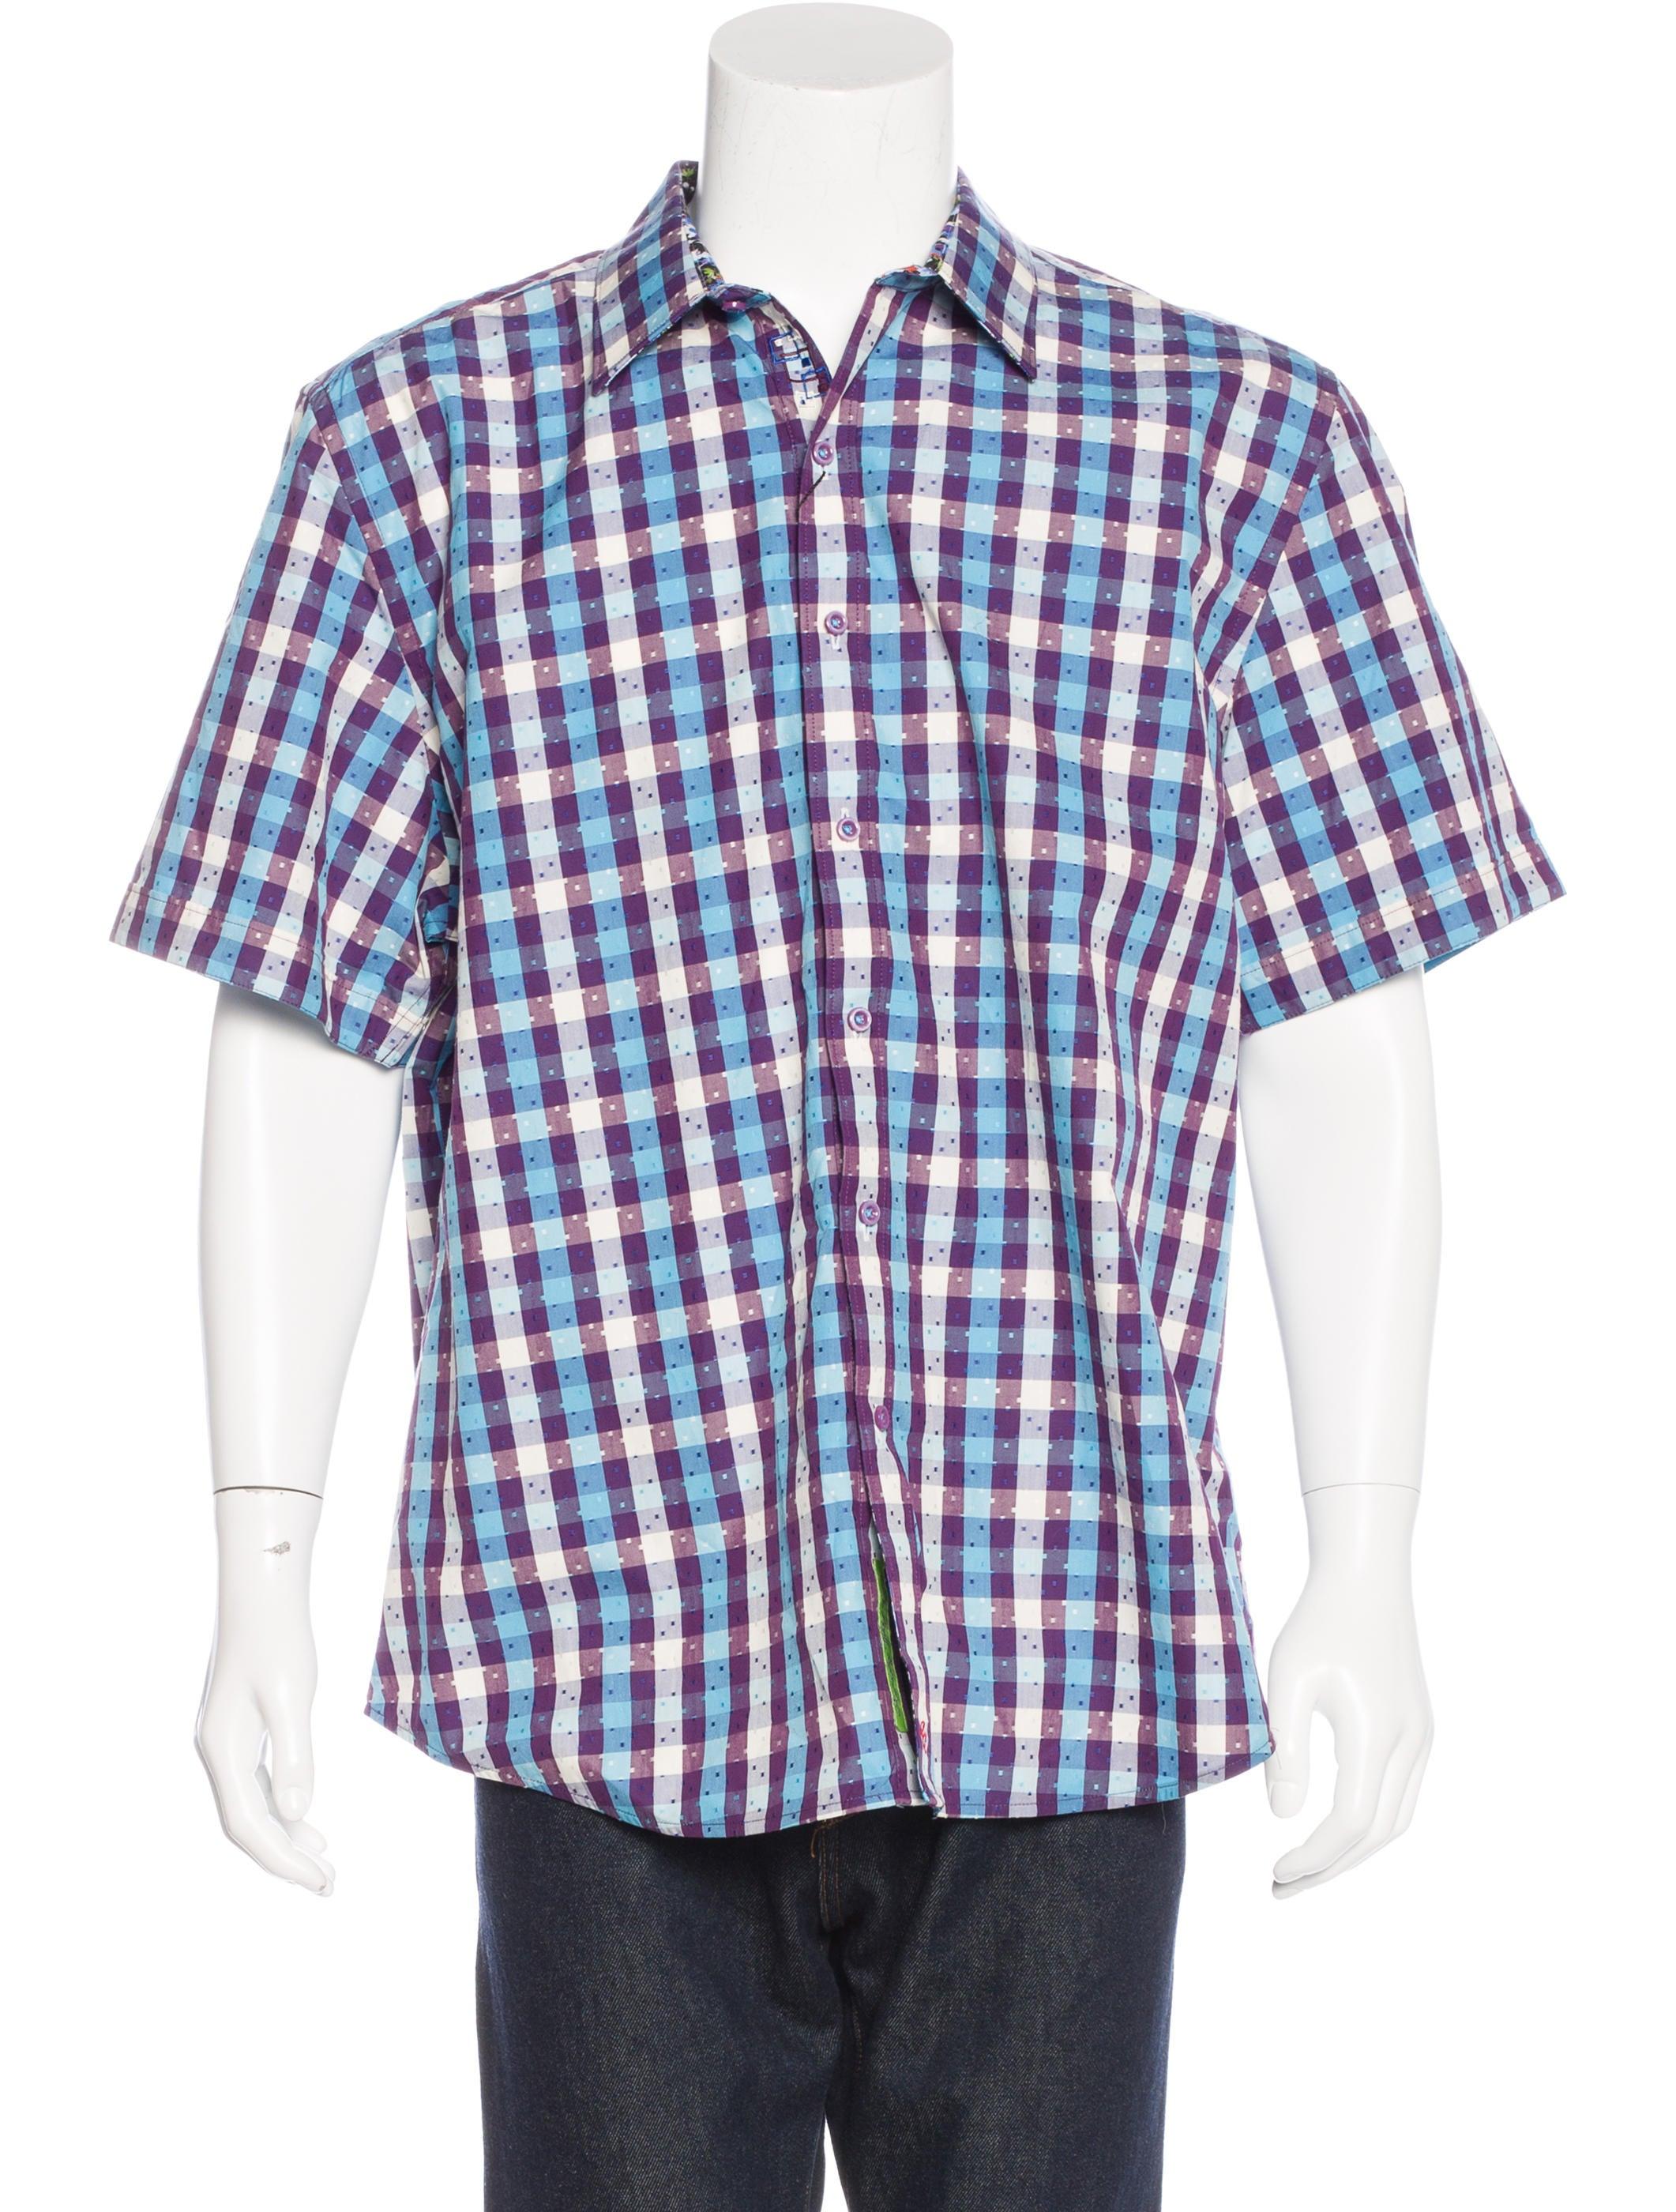 Robert Graham Embroidered Gingham Shirt W Tags Clothing Wrobg20937 The Realreal